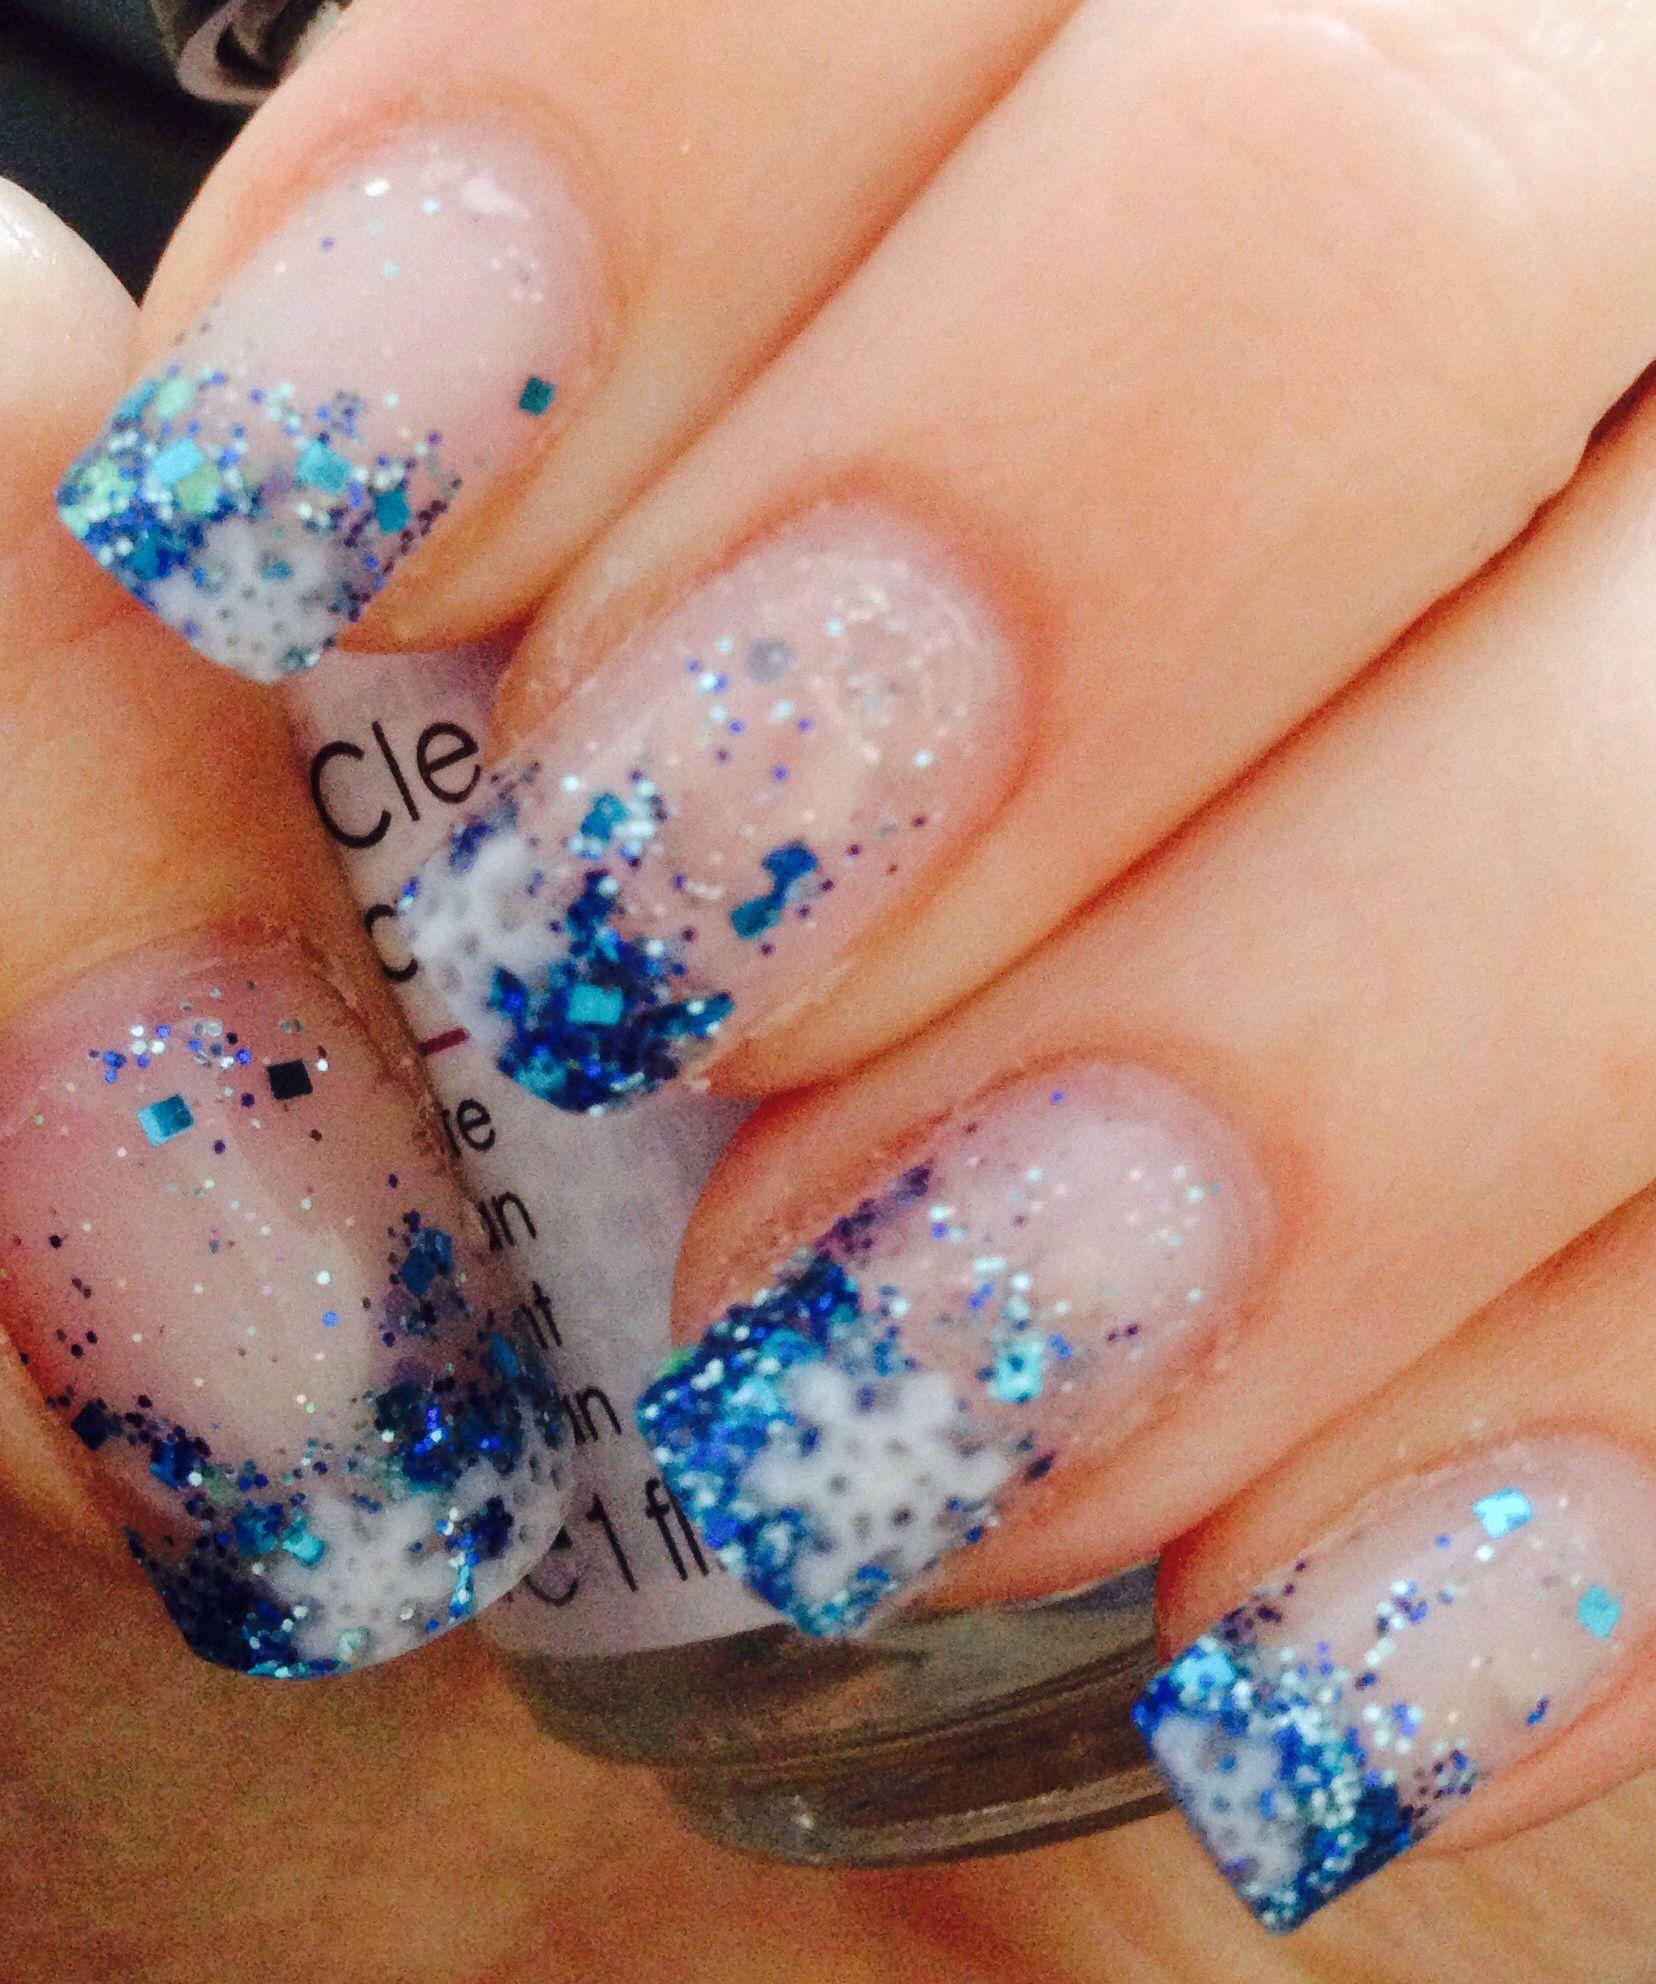 Frozen nails. Elsa. Jack Frost nails. Acrylic glitter nails | nail ...